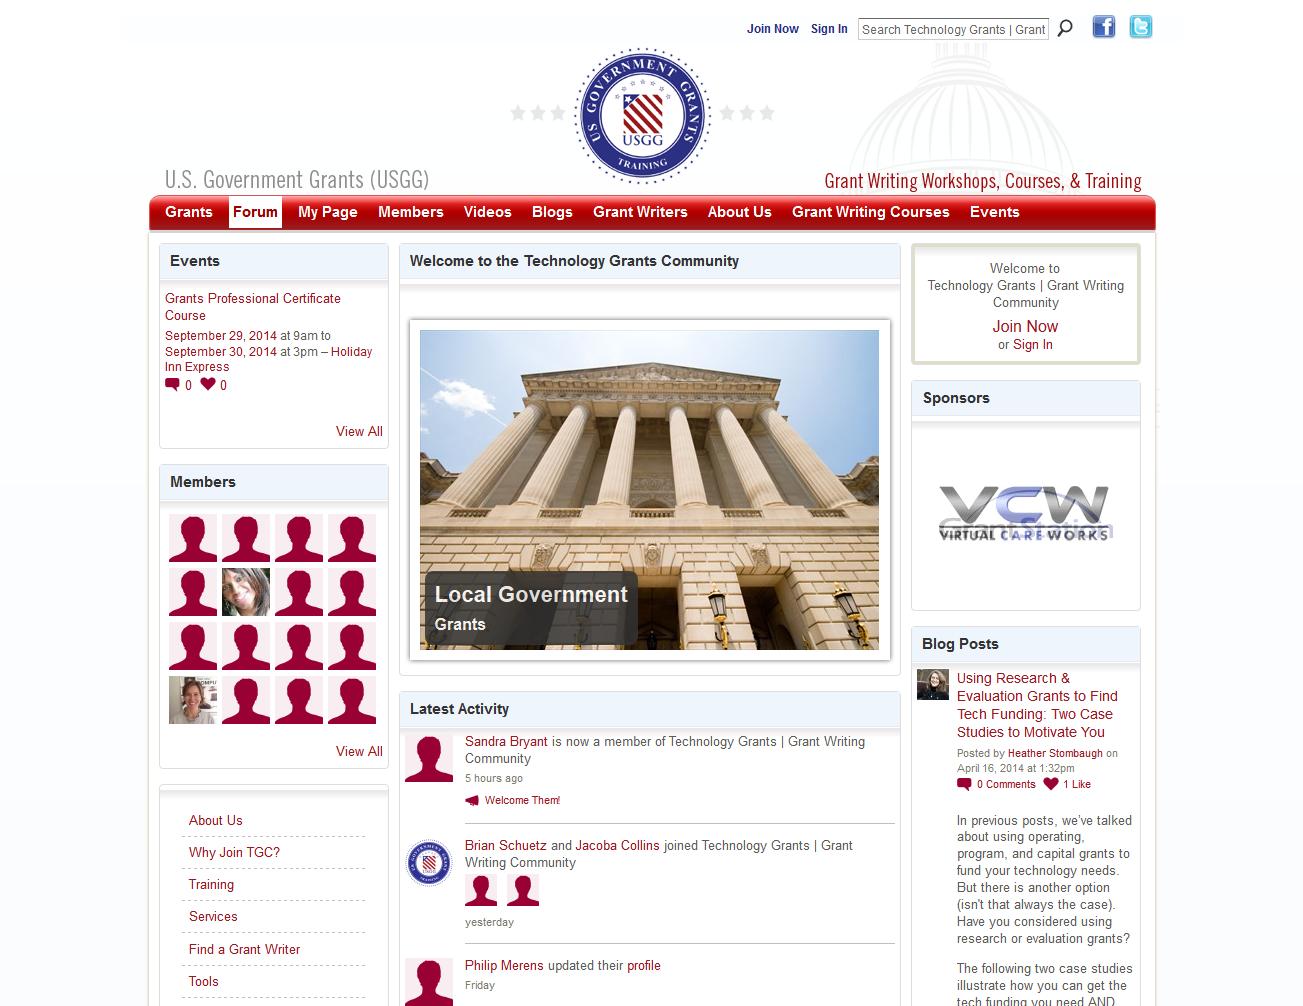 U.S. Government Grants - Ning 2.0 Design